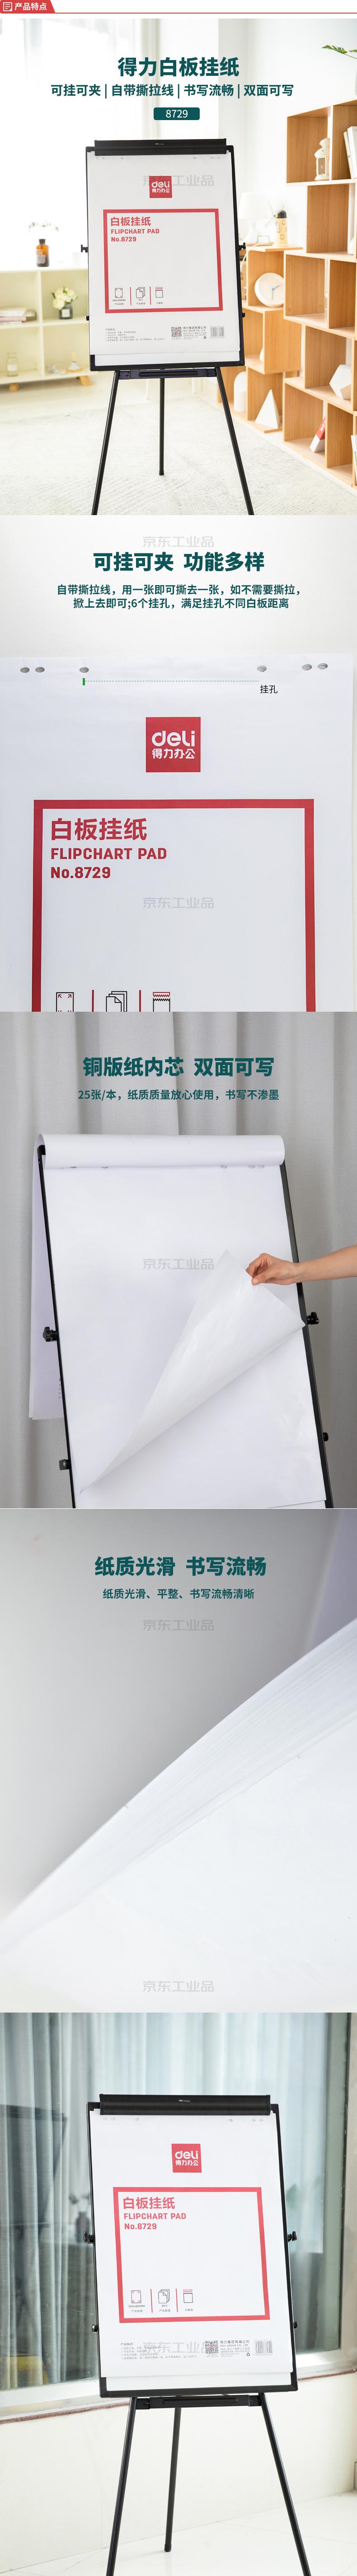 得力(deli) 8729白板挂纸810*580mm(25张/卷)(白色);8729白